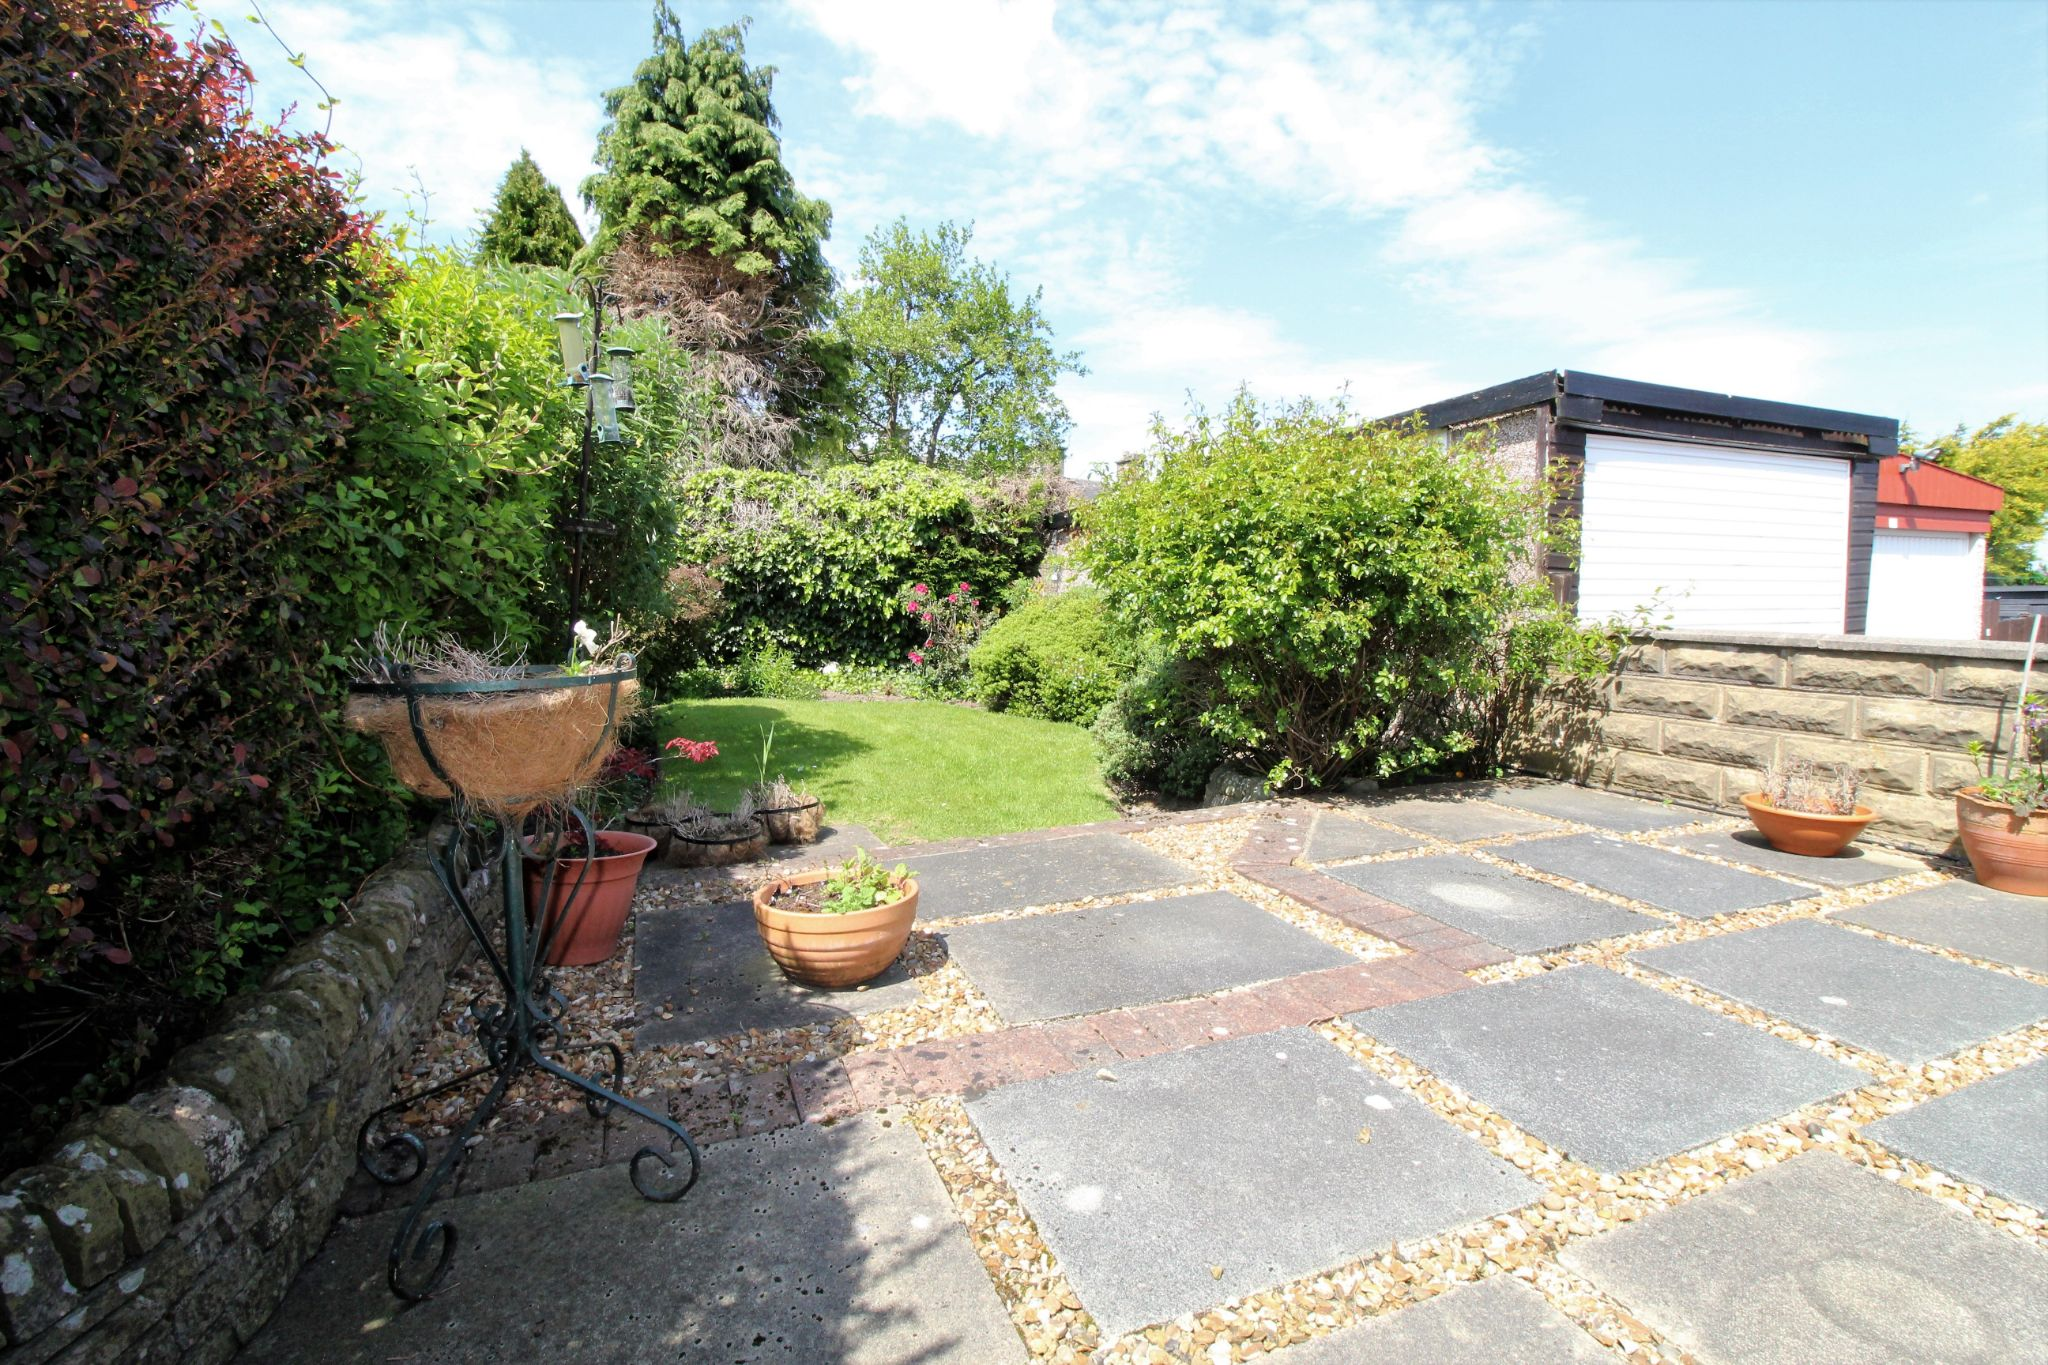 2 bedroom semi-detached bungalow SSTC in Bradford - Rear garden and patio